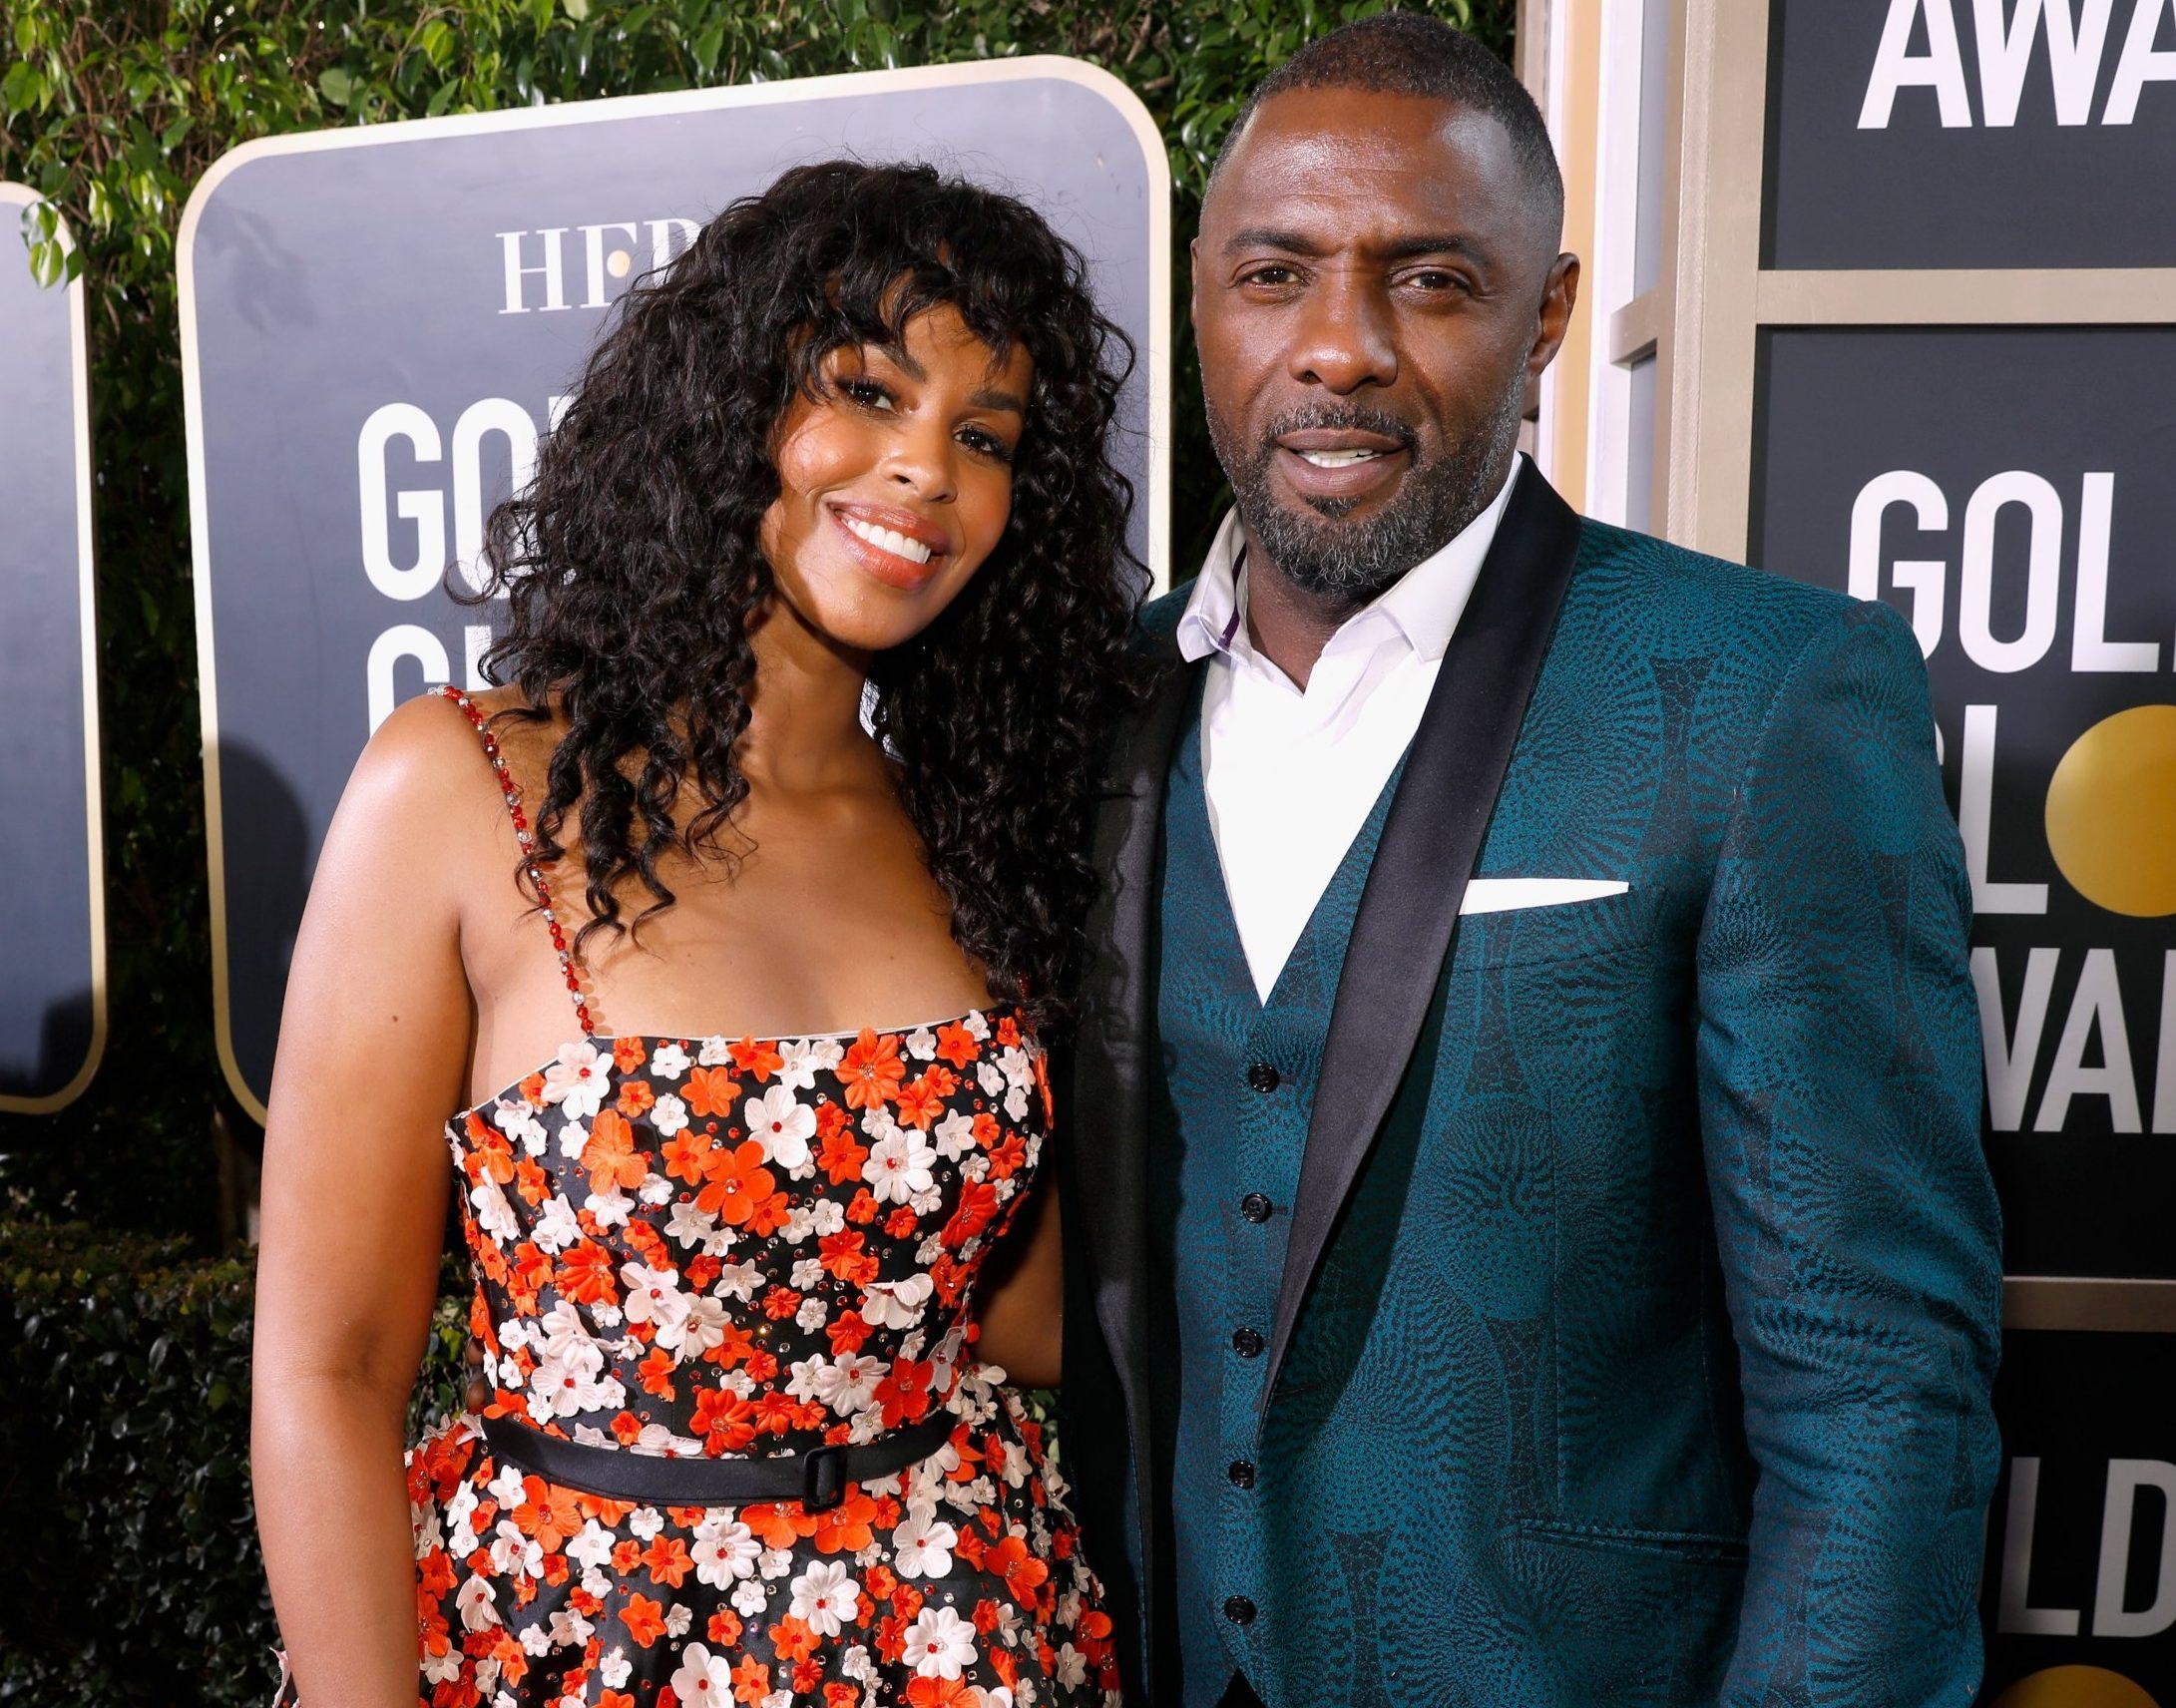 Idris Elba's fiancée Sabrina Dhowre gives glimpse at lavish hen party ahead of wedding